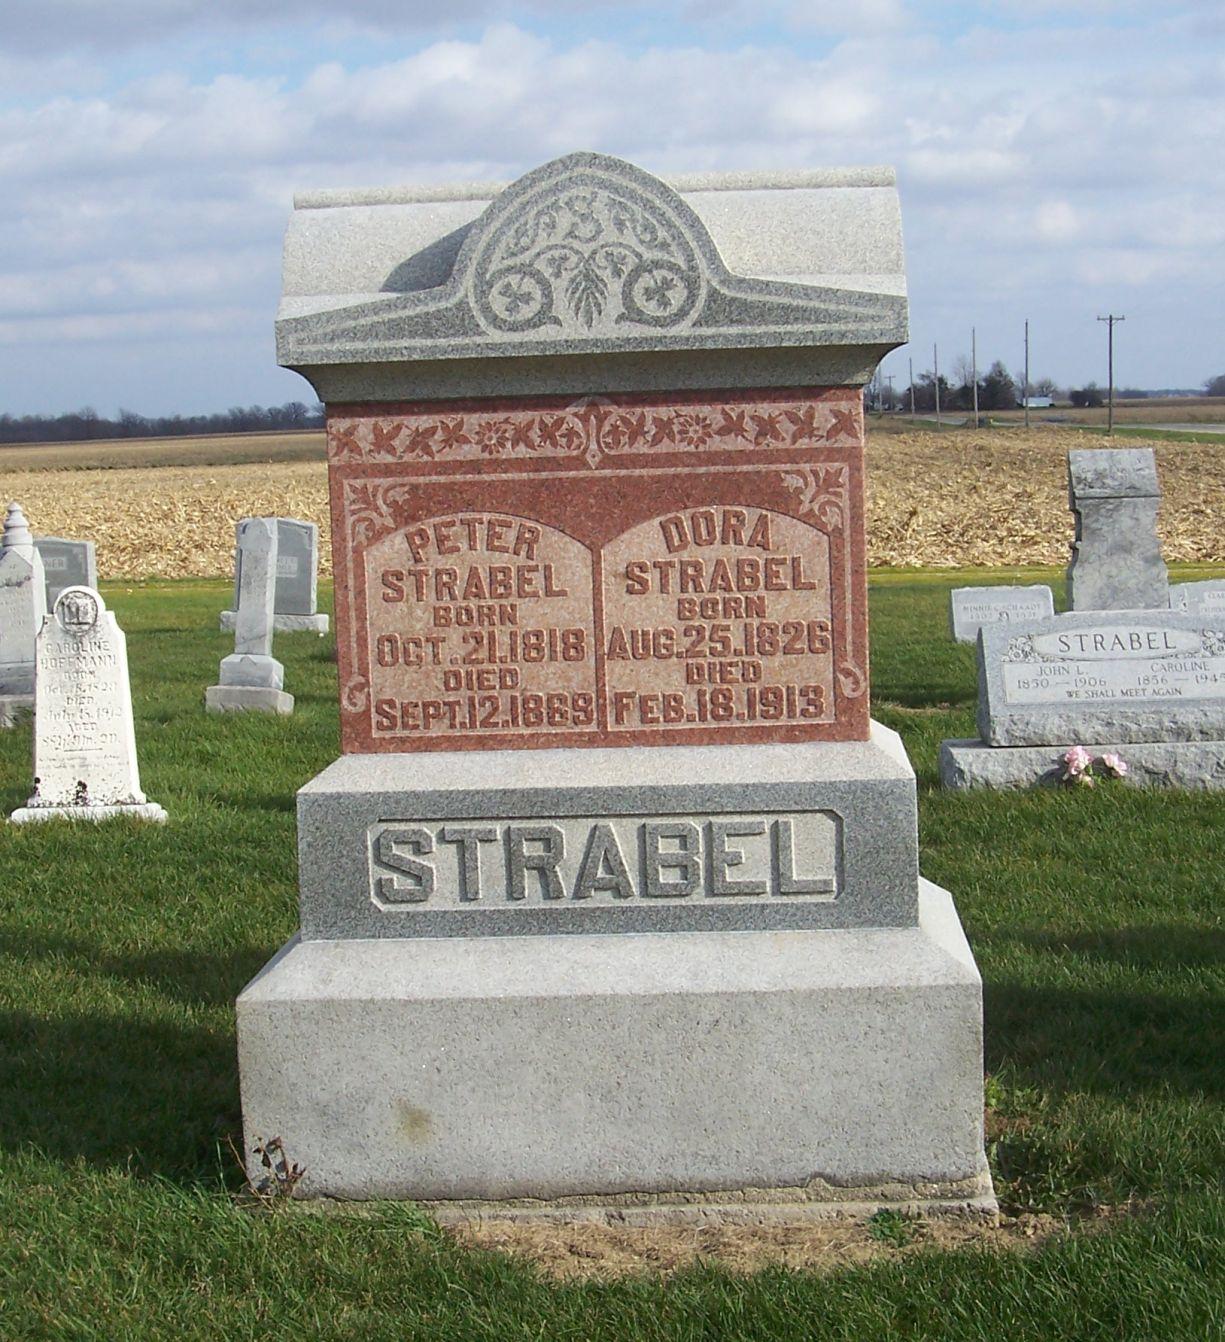 Ohio mercer county rockford - Peter Dora Strabel Zion Lutheran Cemetery Mercer County Ohio 2011